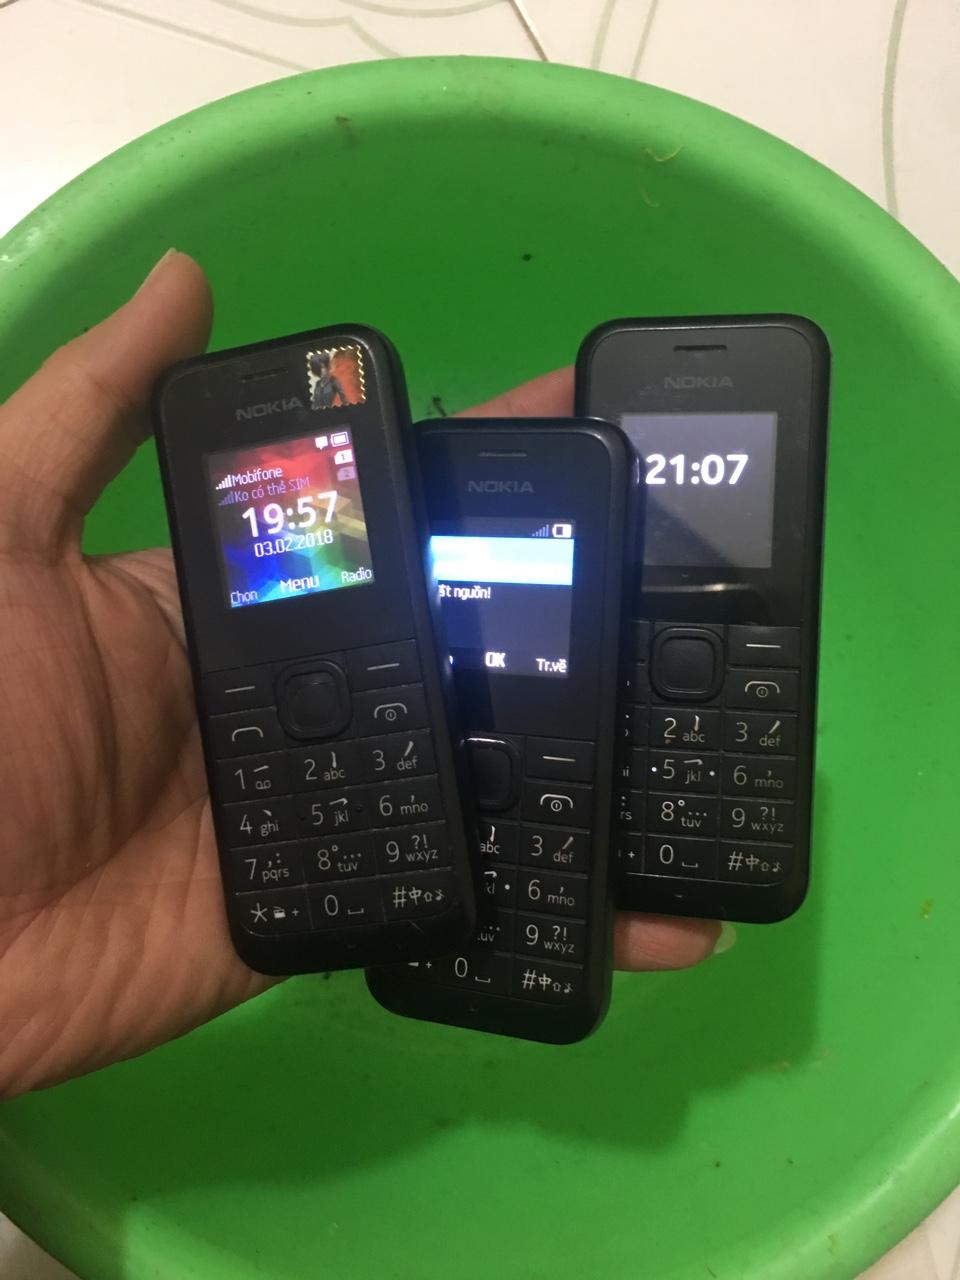 1 Nokia 105 nokia 1202 nokia rm1133 thanh lý cuối năm hết